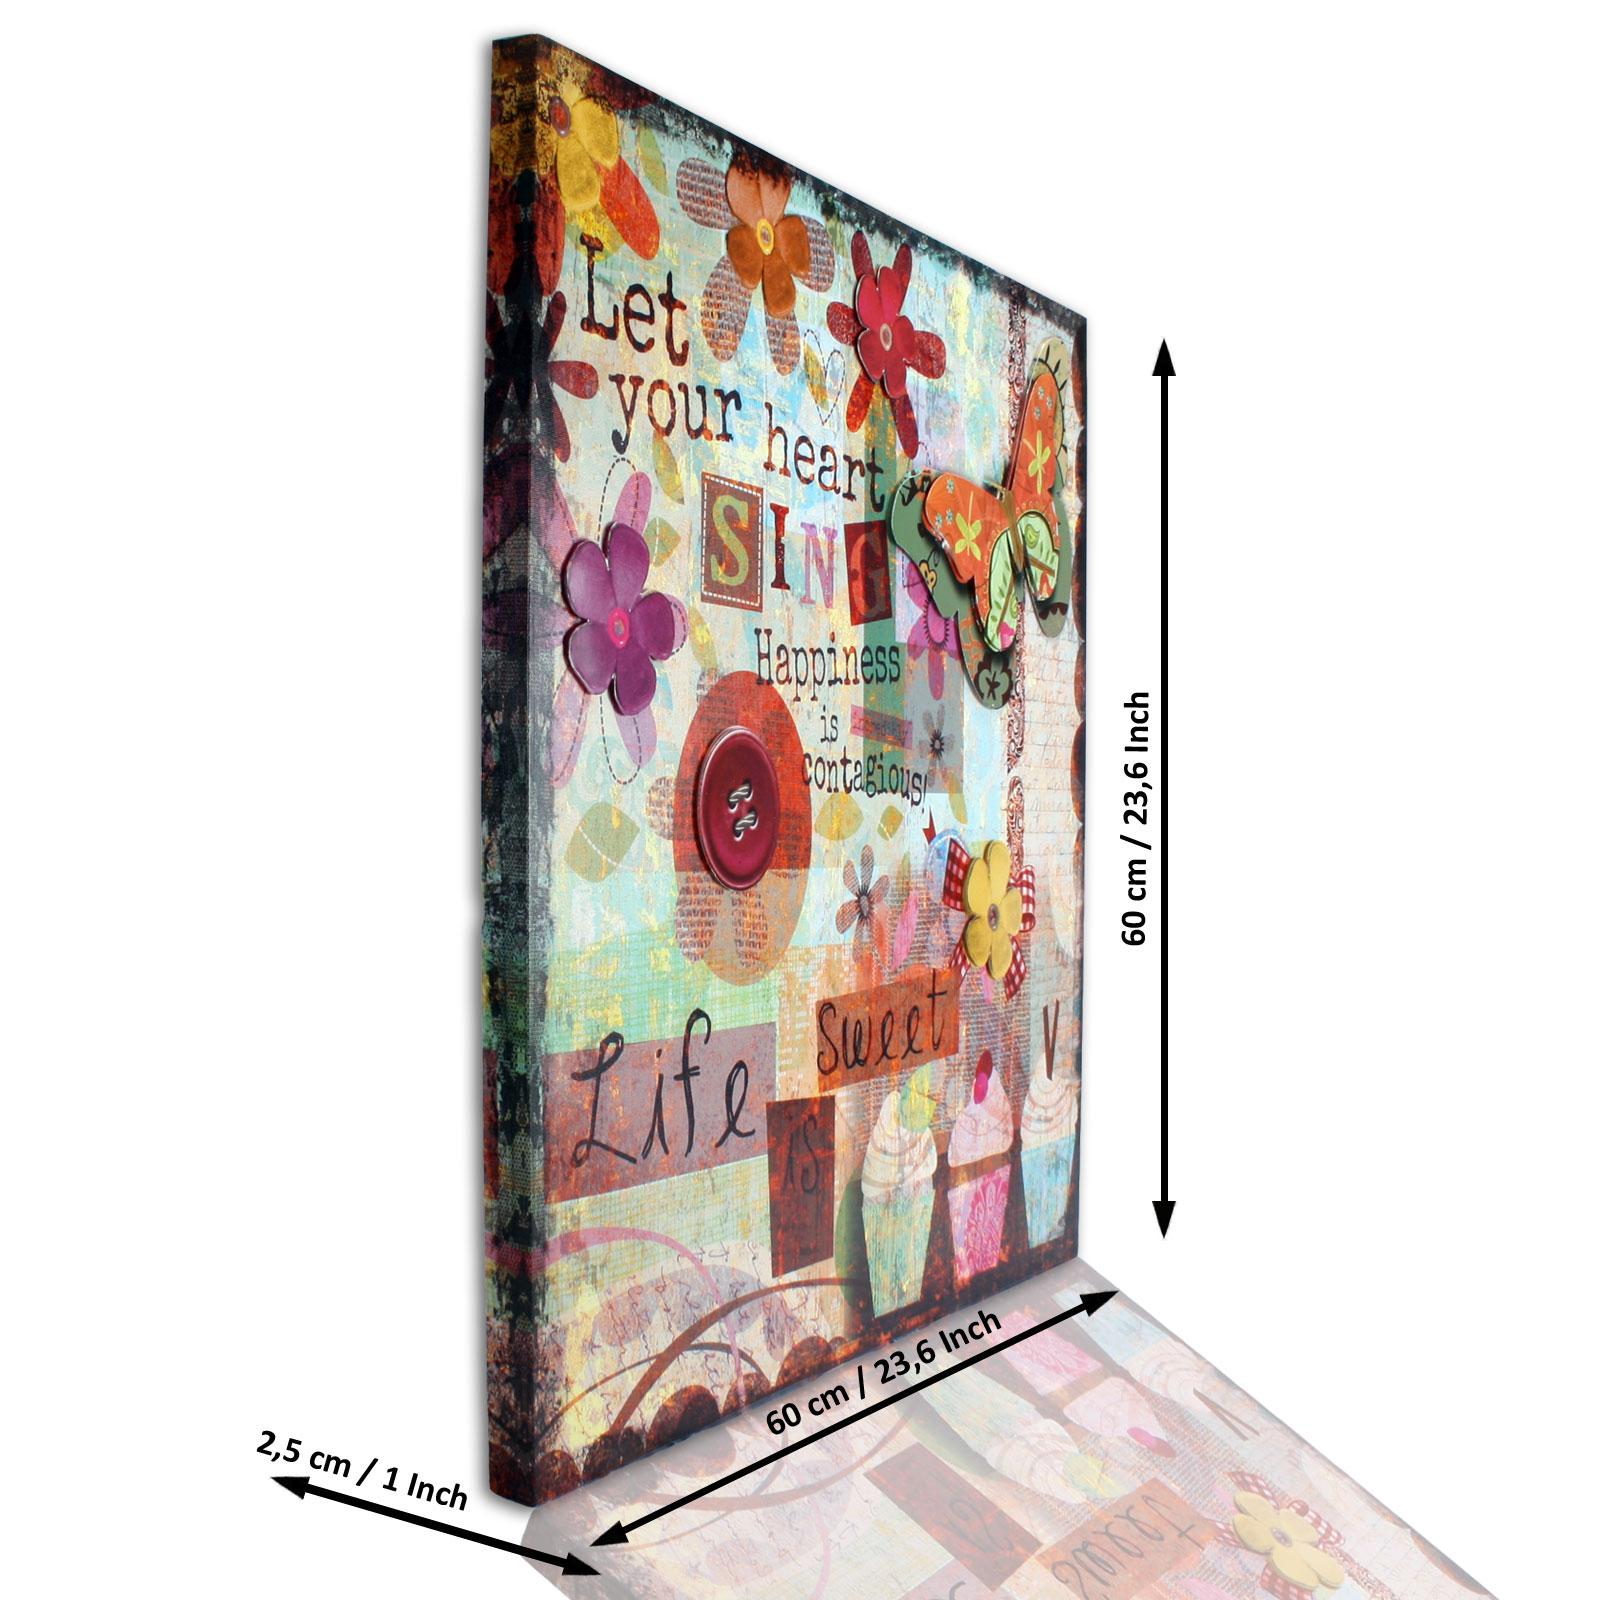 leinwandbild leinwand bild 3d look bunt kunstdruck. Black Bedroom Furniture Sets. Home Design Ideas